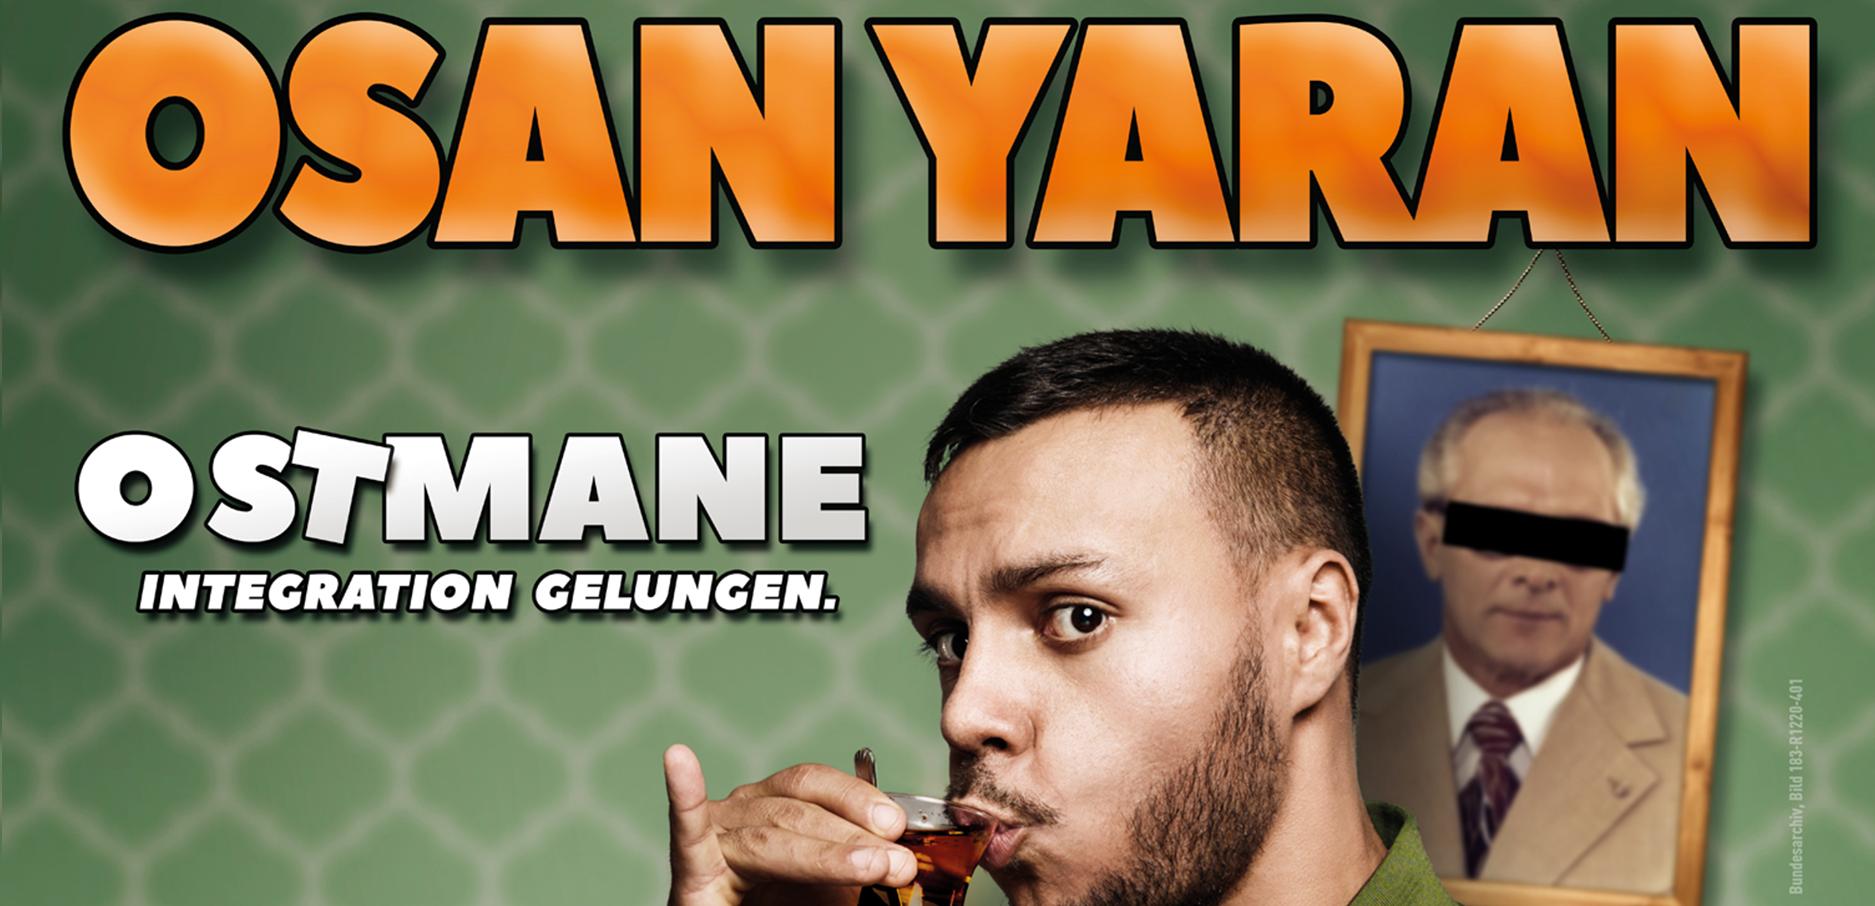 1-osan-yaran-comedy-splash-300x145 Kopie